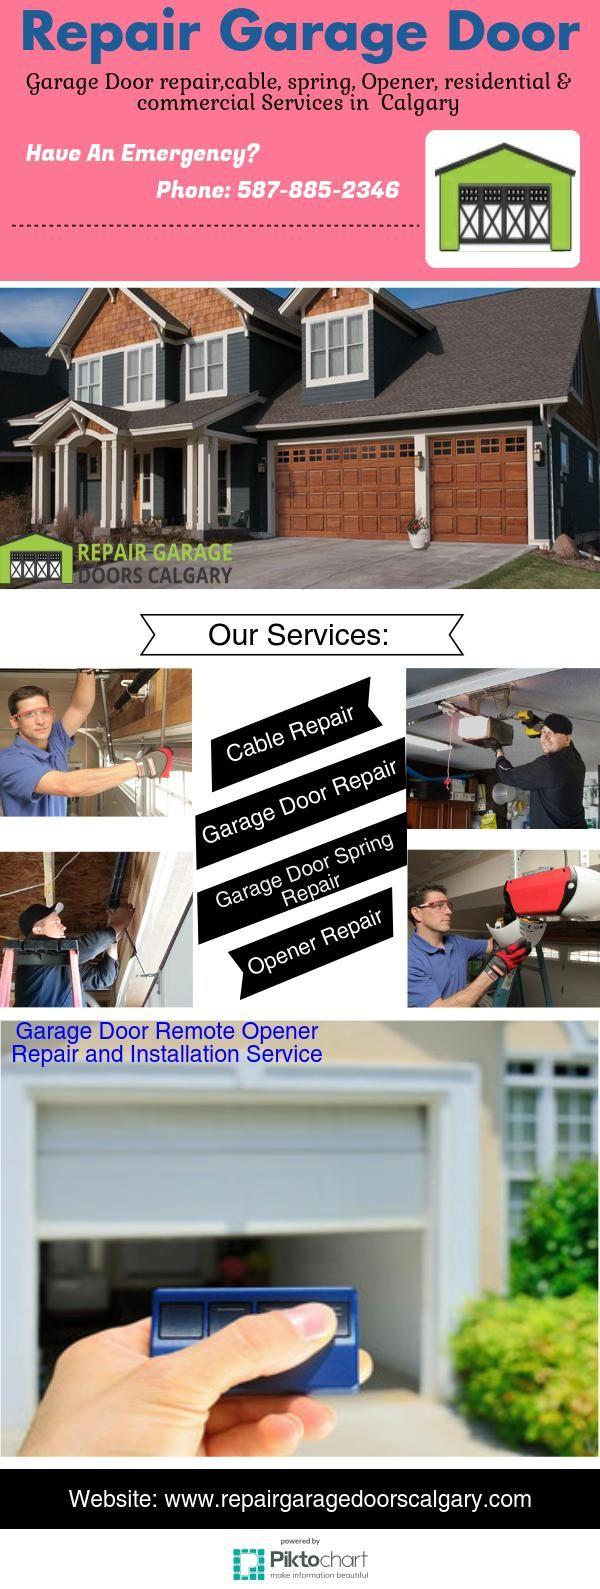 24 7 Garage Door Repair Services Available In Calgary We Offer Same Day Repair Service Feel Free To Contact Us Garage Door Repair Service Garage Door Repair